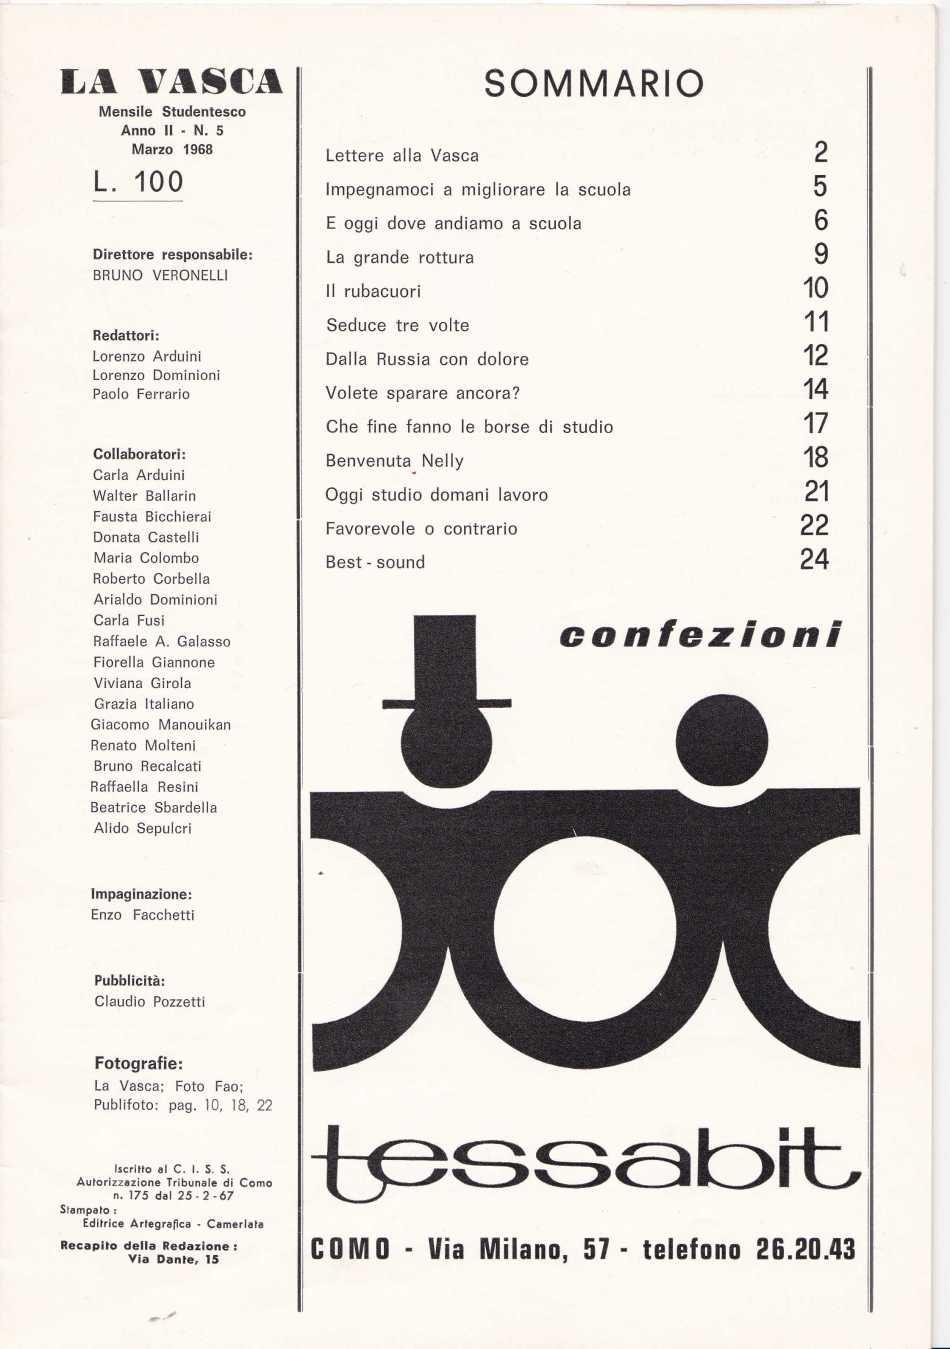 vasca 5 19683058